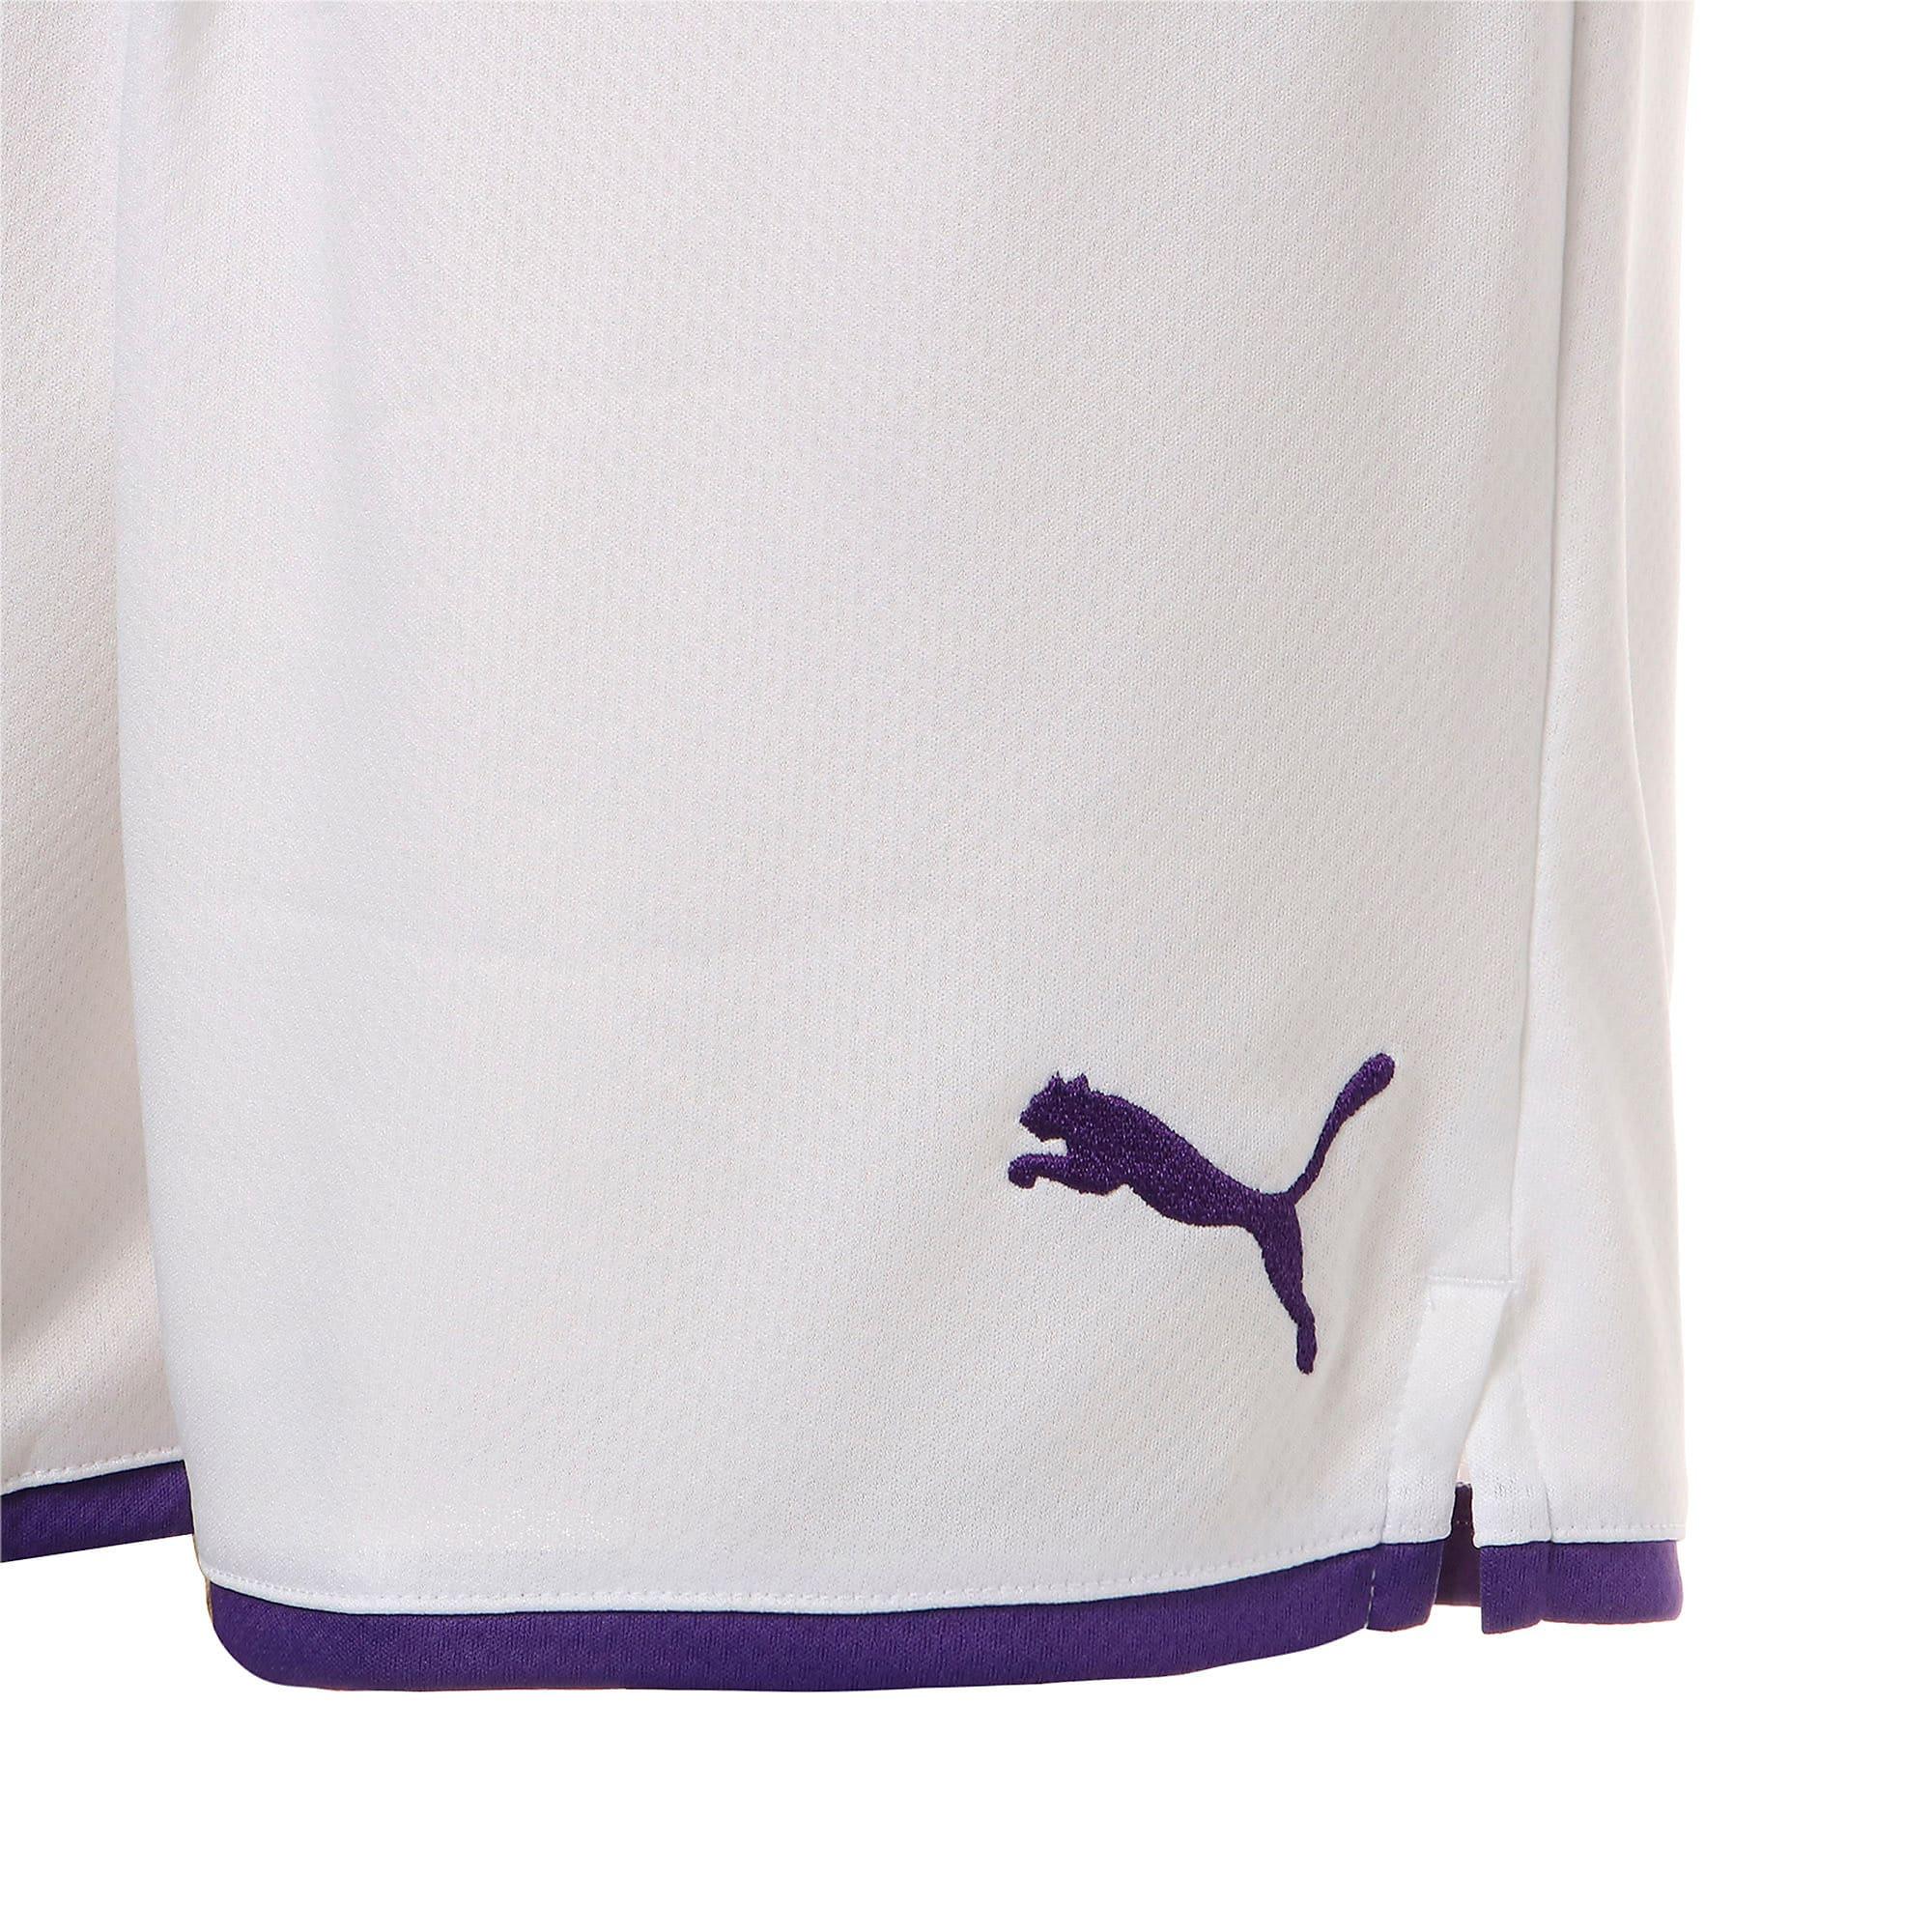 Thumbnail 6 of マンチェスター・シティ MCFC レプリカショーツ, Puma White-Tillandsia Purple, medium-JPN